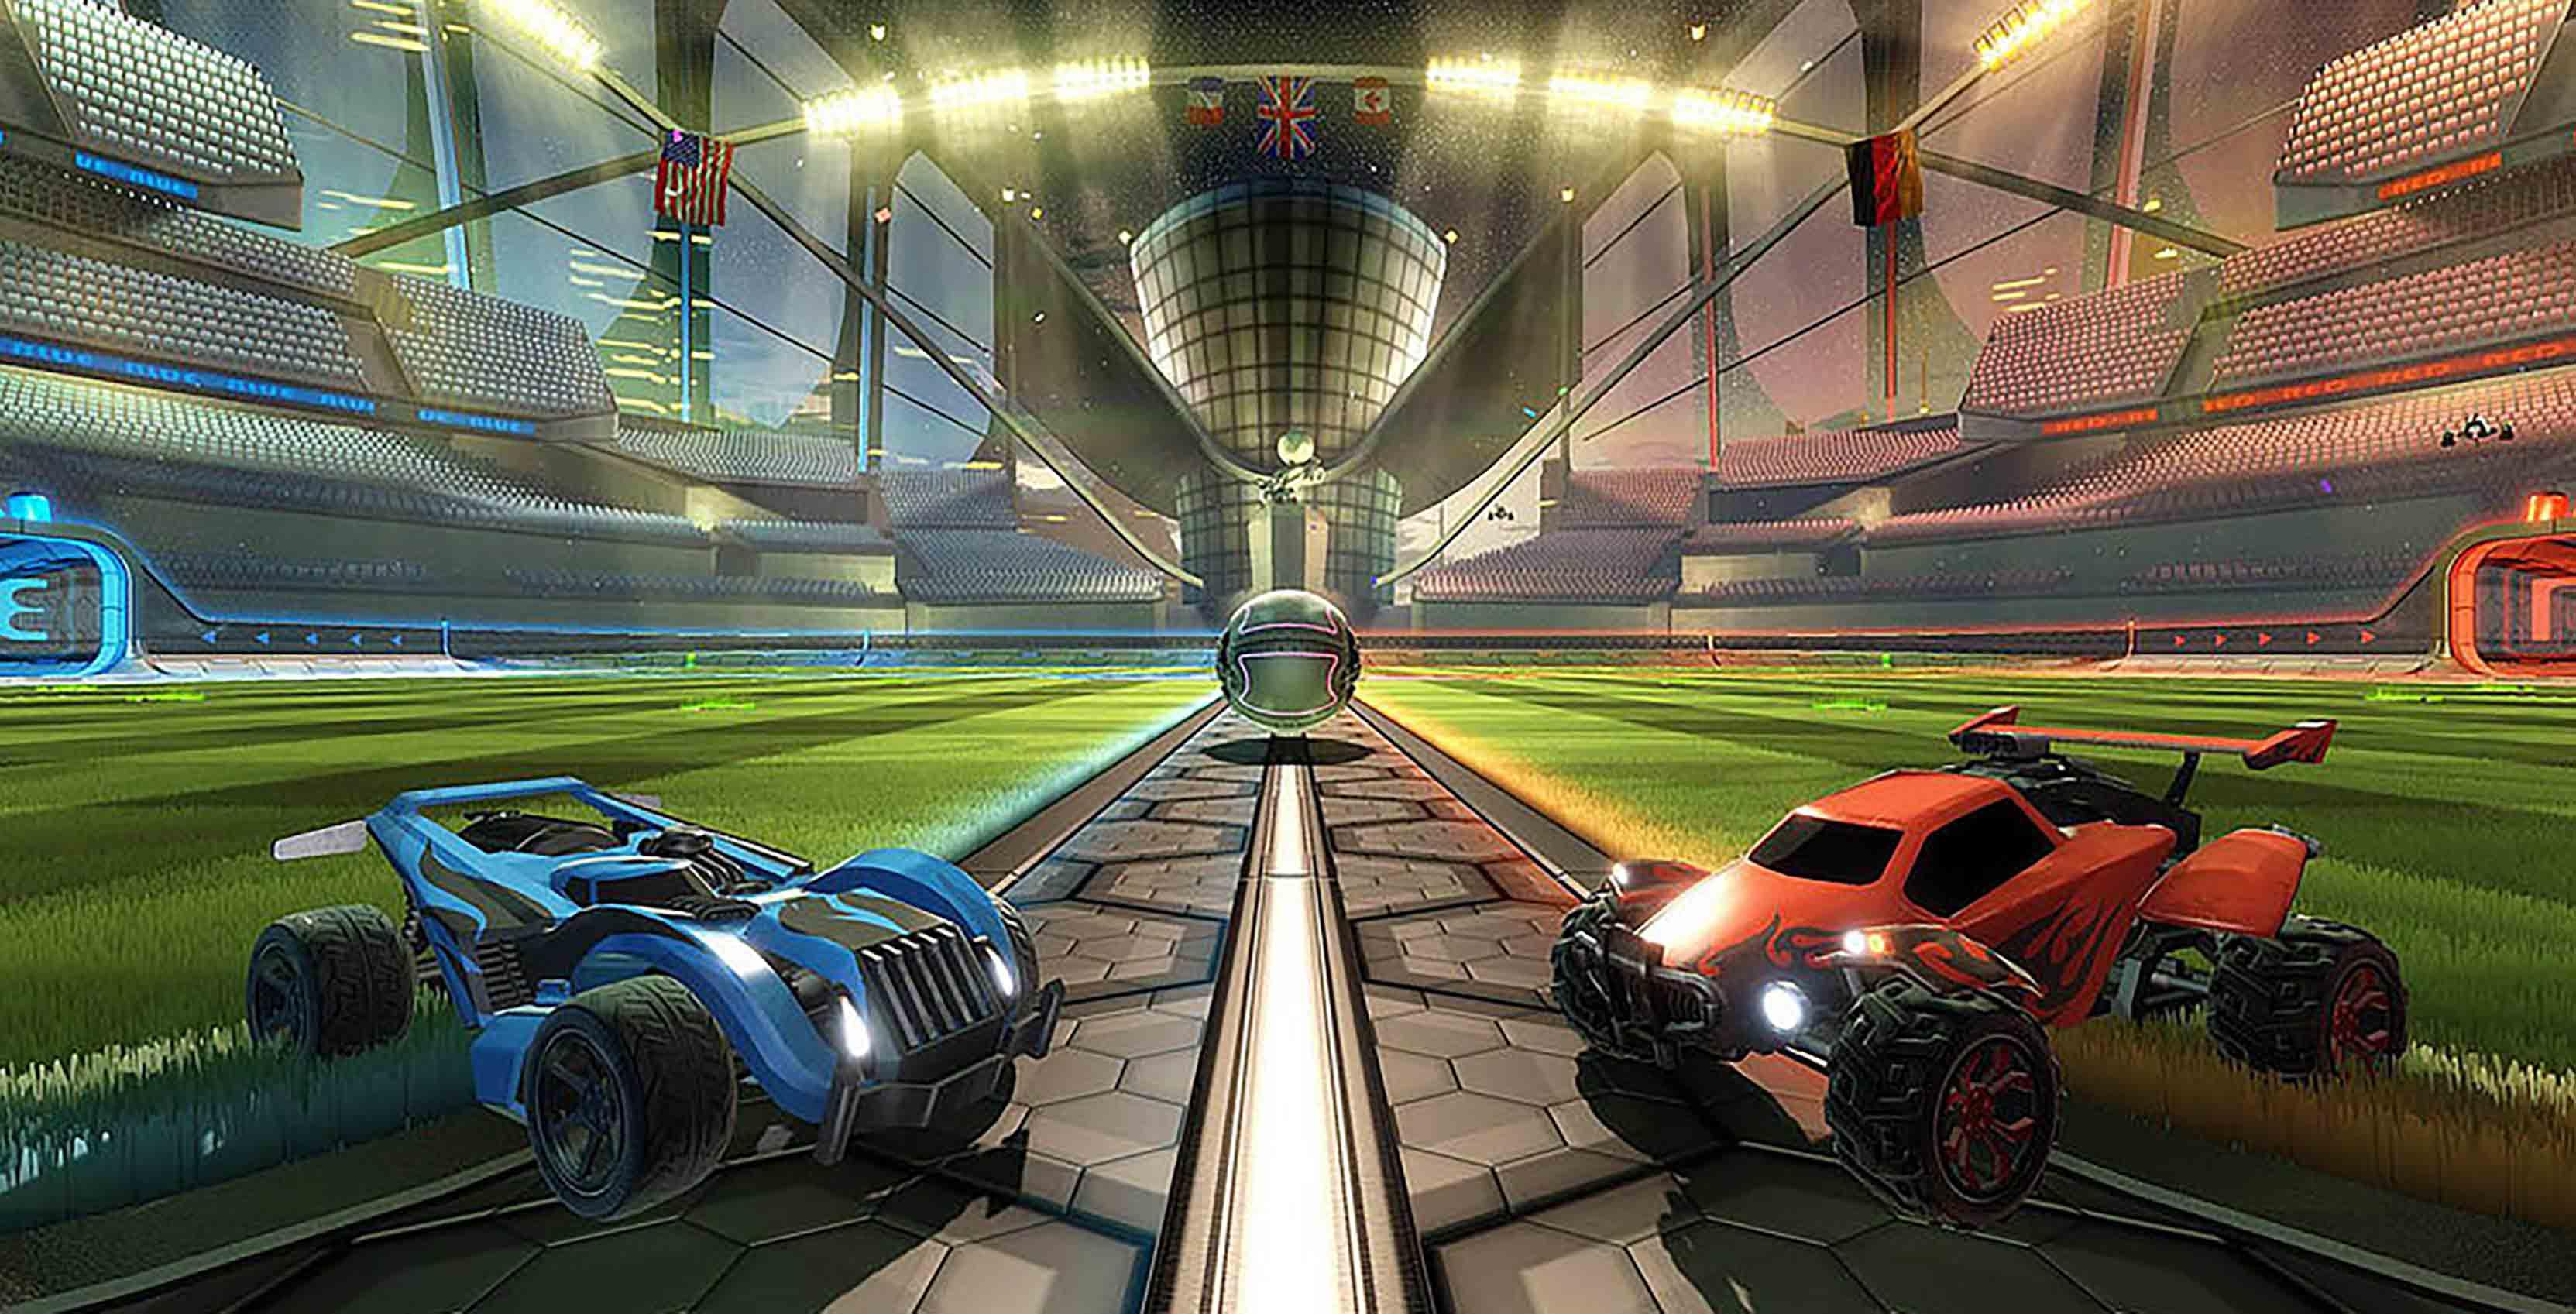 Rocket League game shot